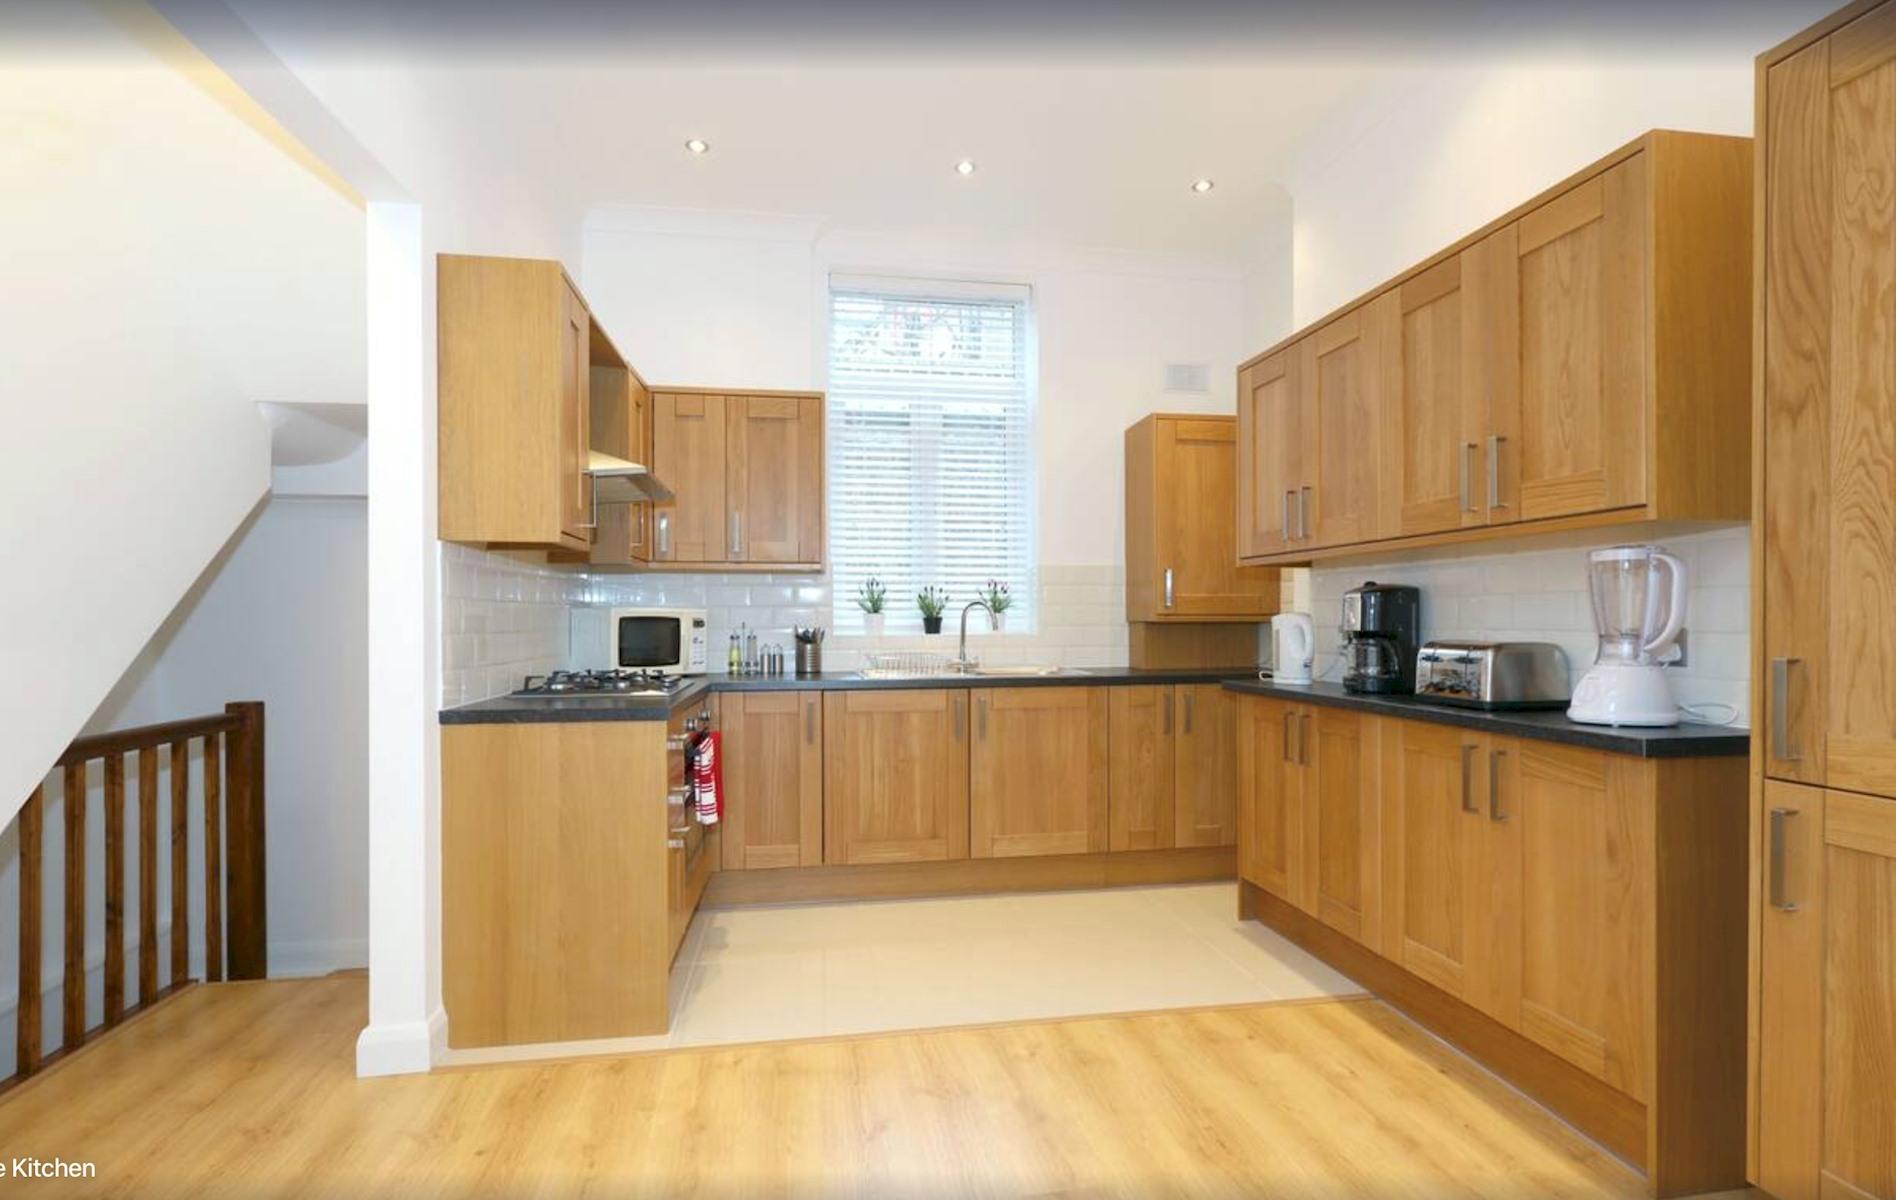 Apartment King s Cross Eurostar Double Room - Shared Bathroom - Shared Kitchen  ROOM 4  photo 25594472